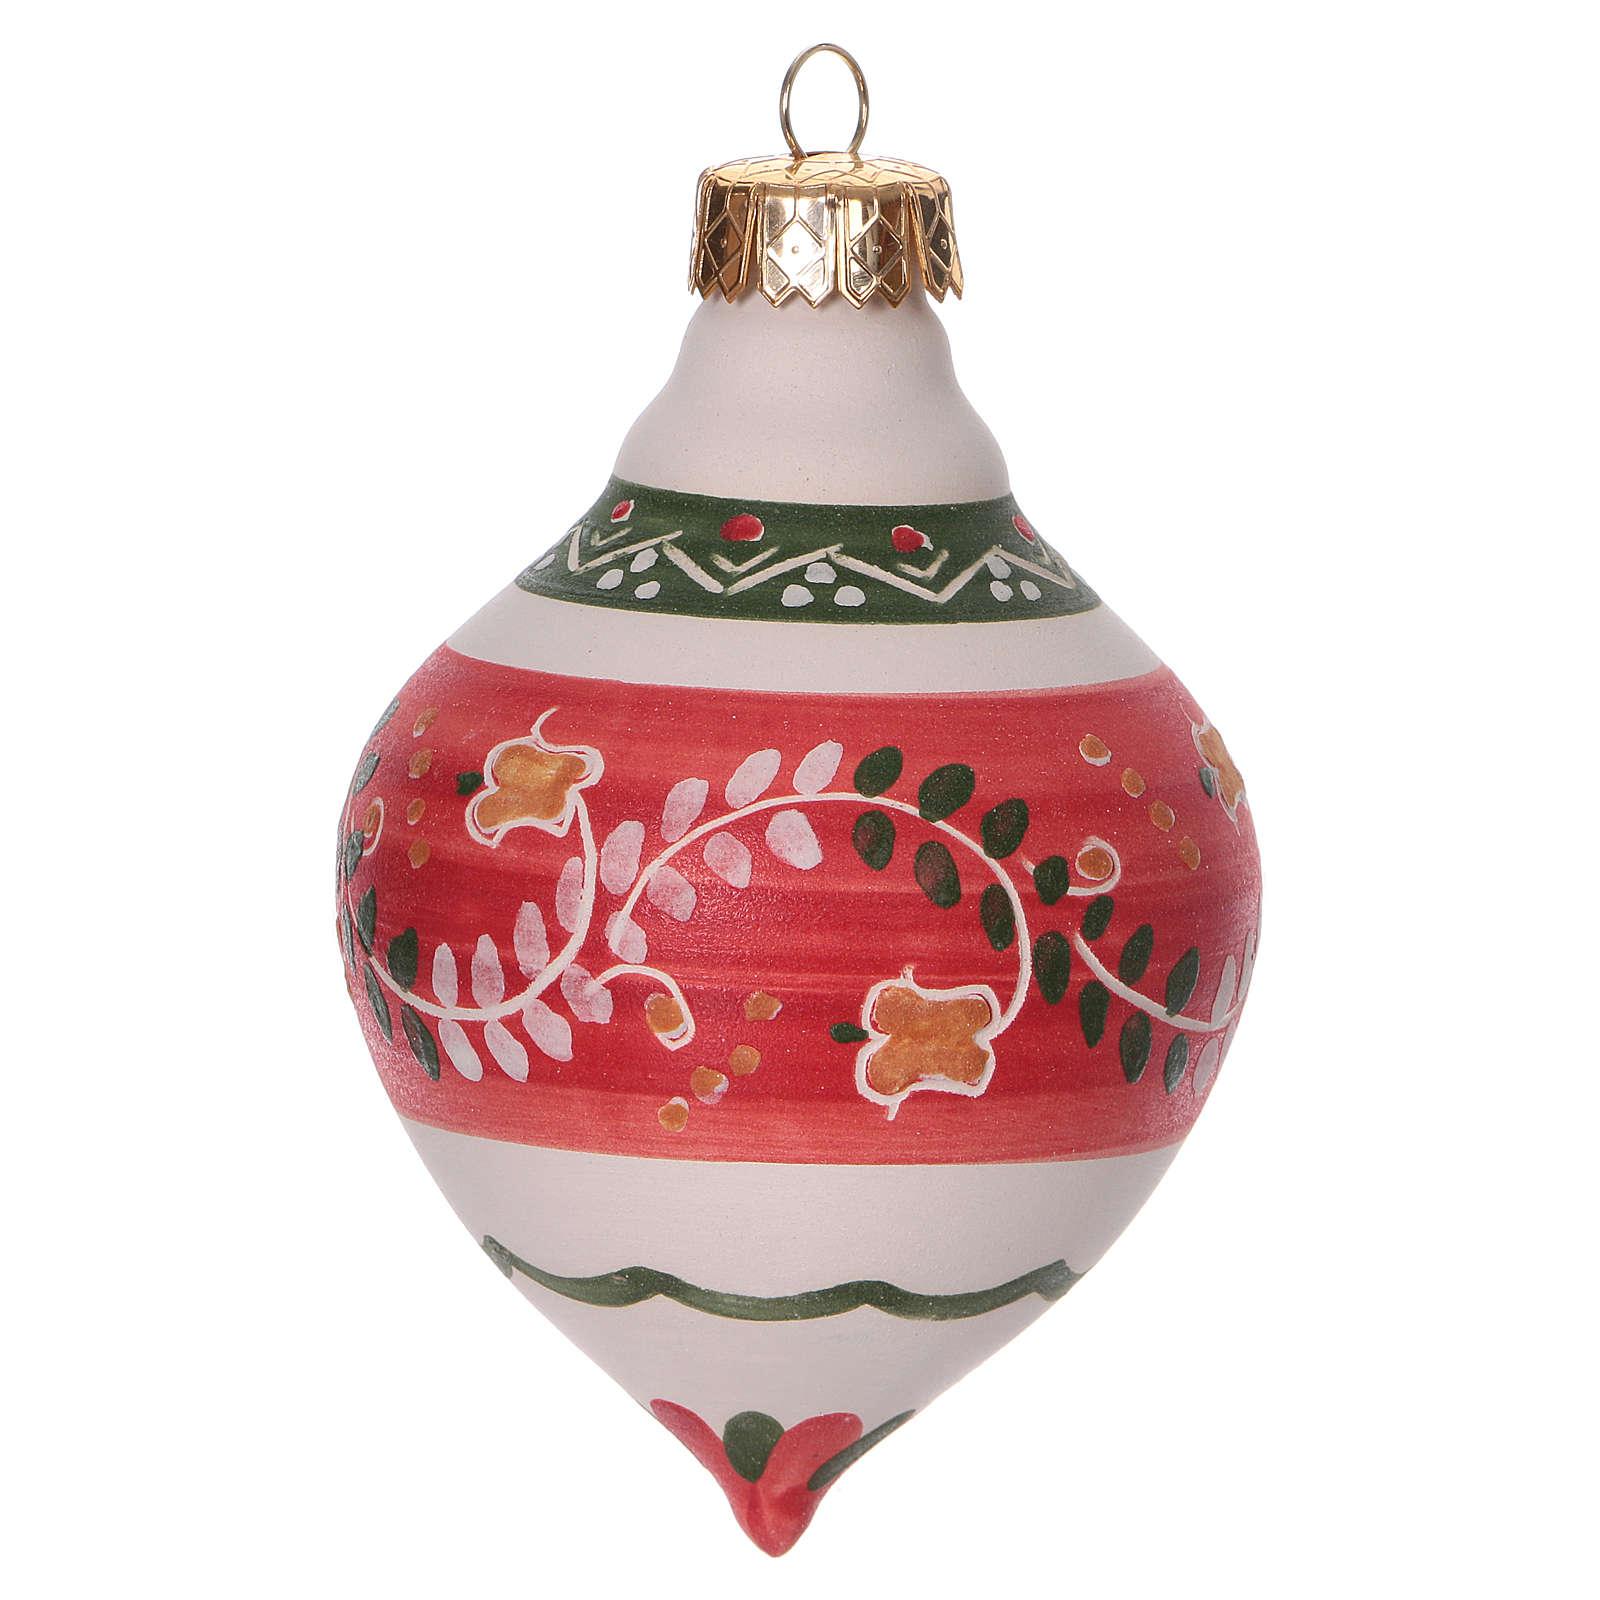 Pallina a doppia punta rossa per albero Natale in terracotta 120 mm 4